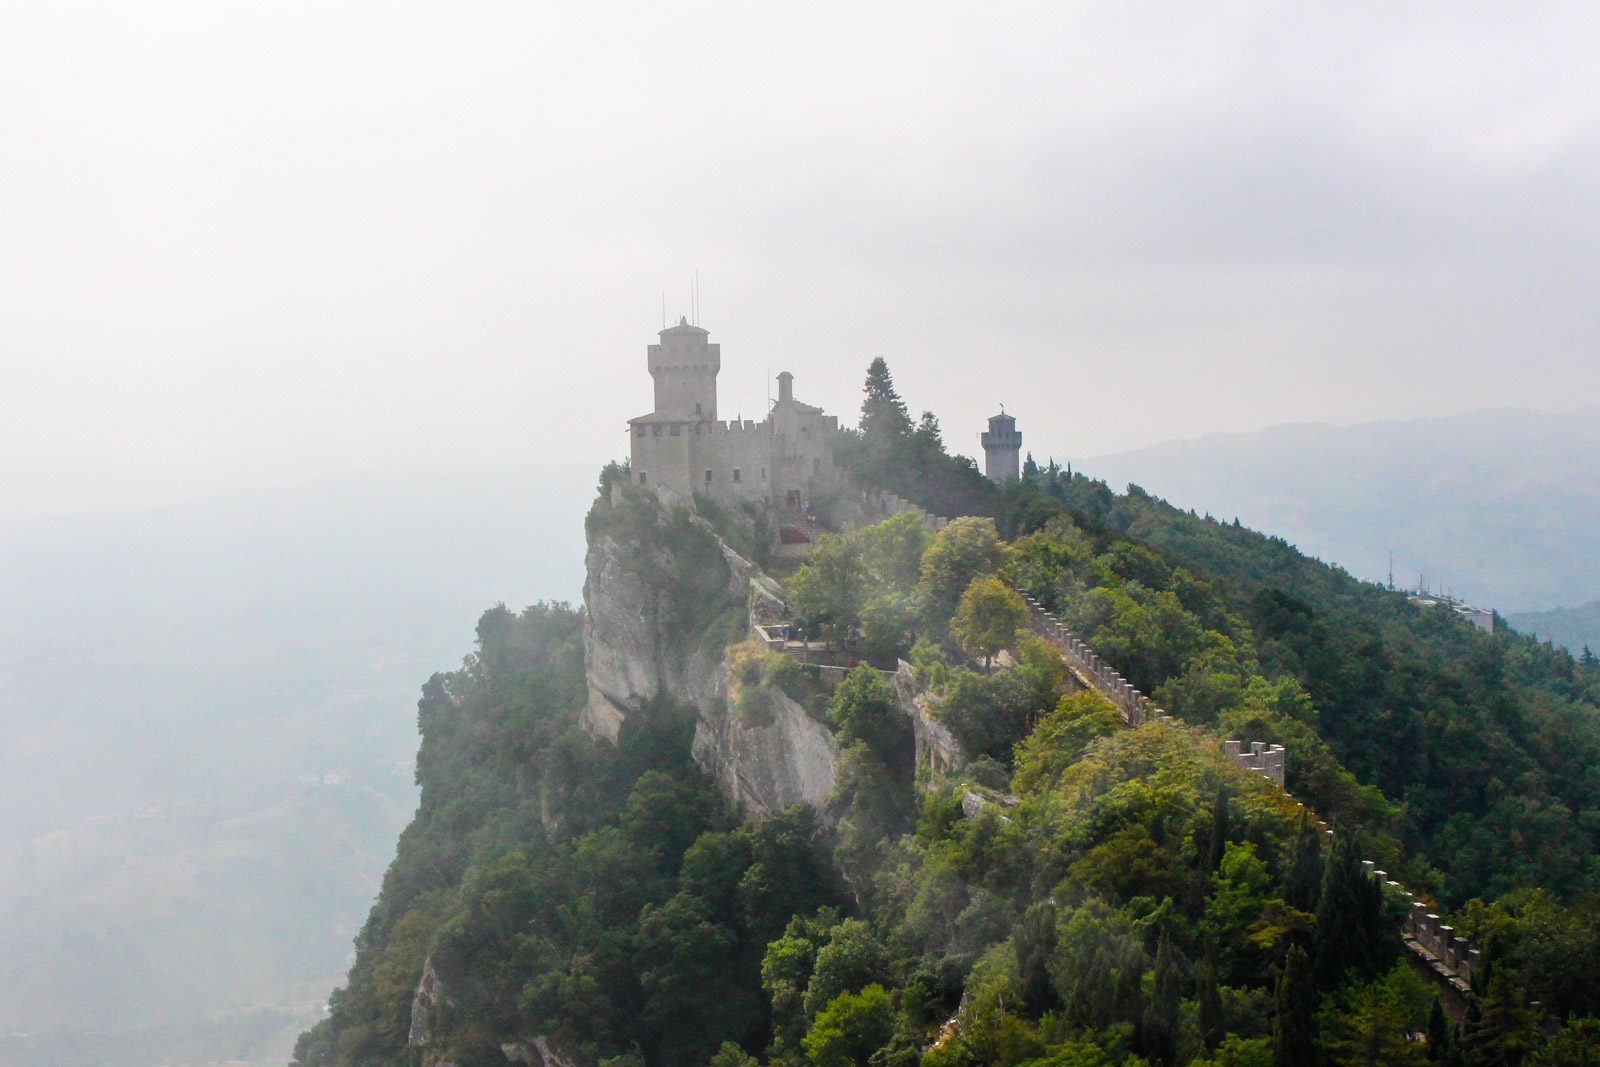 San Marino Europa Nicht-Reiseliste